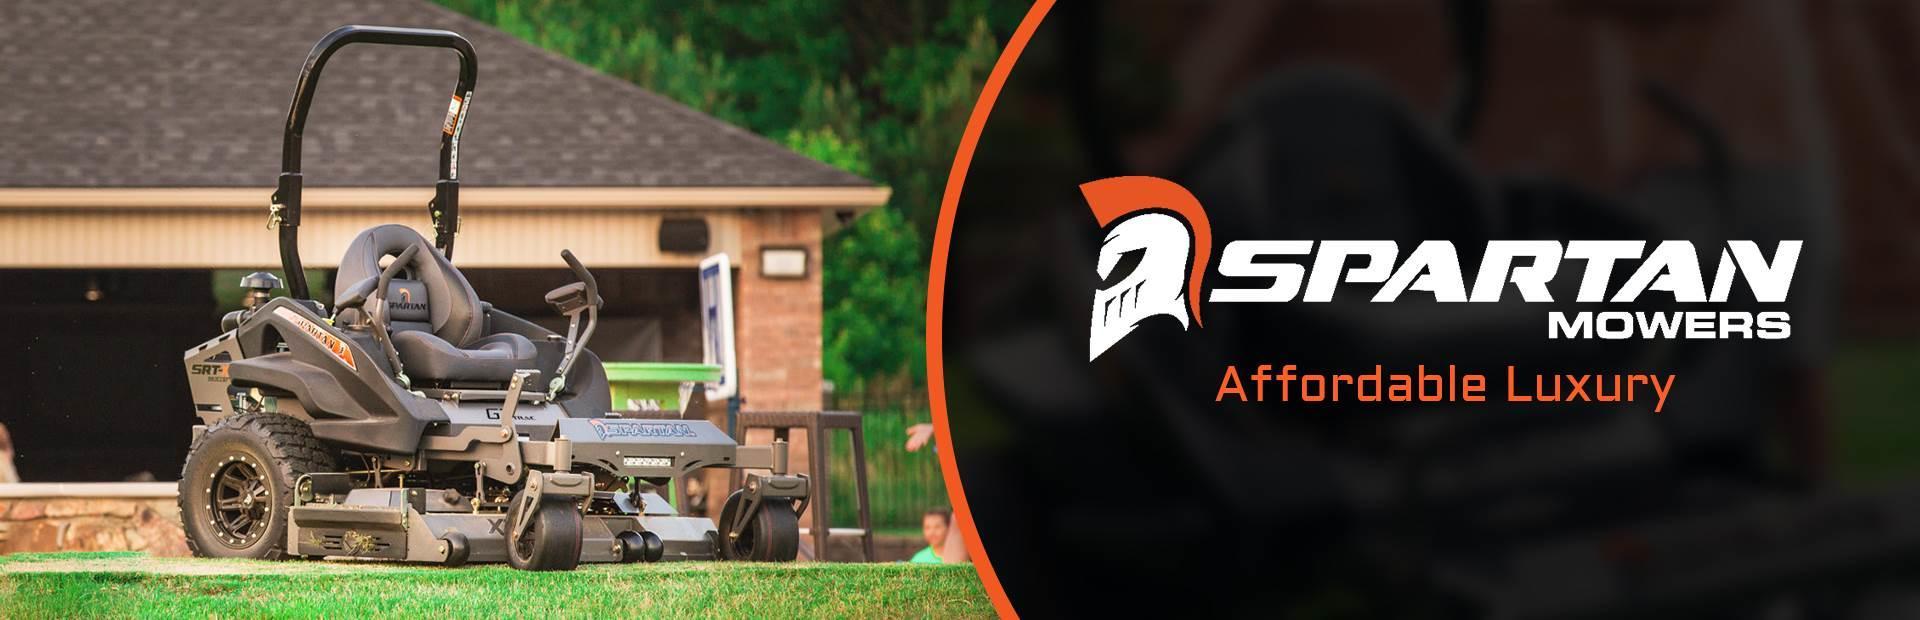 Gamble s Sales & Service 2483 Dayton Rd Springfield, OH Lawn